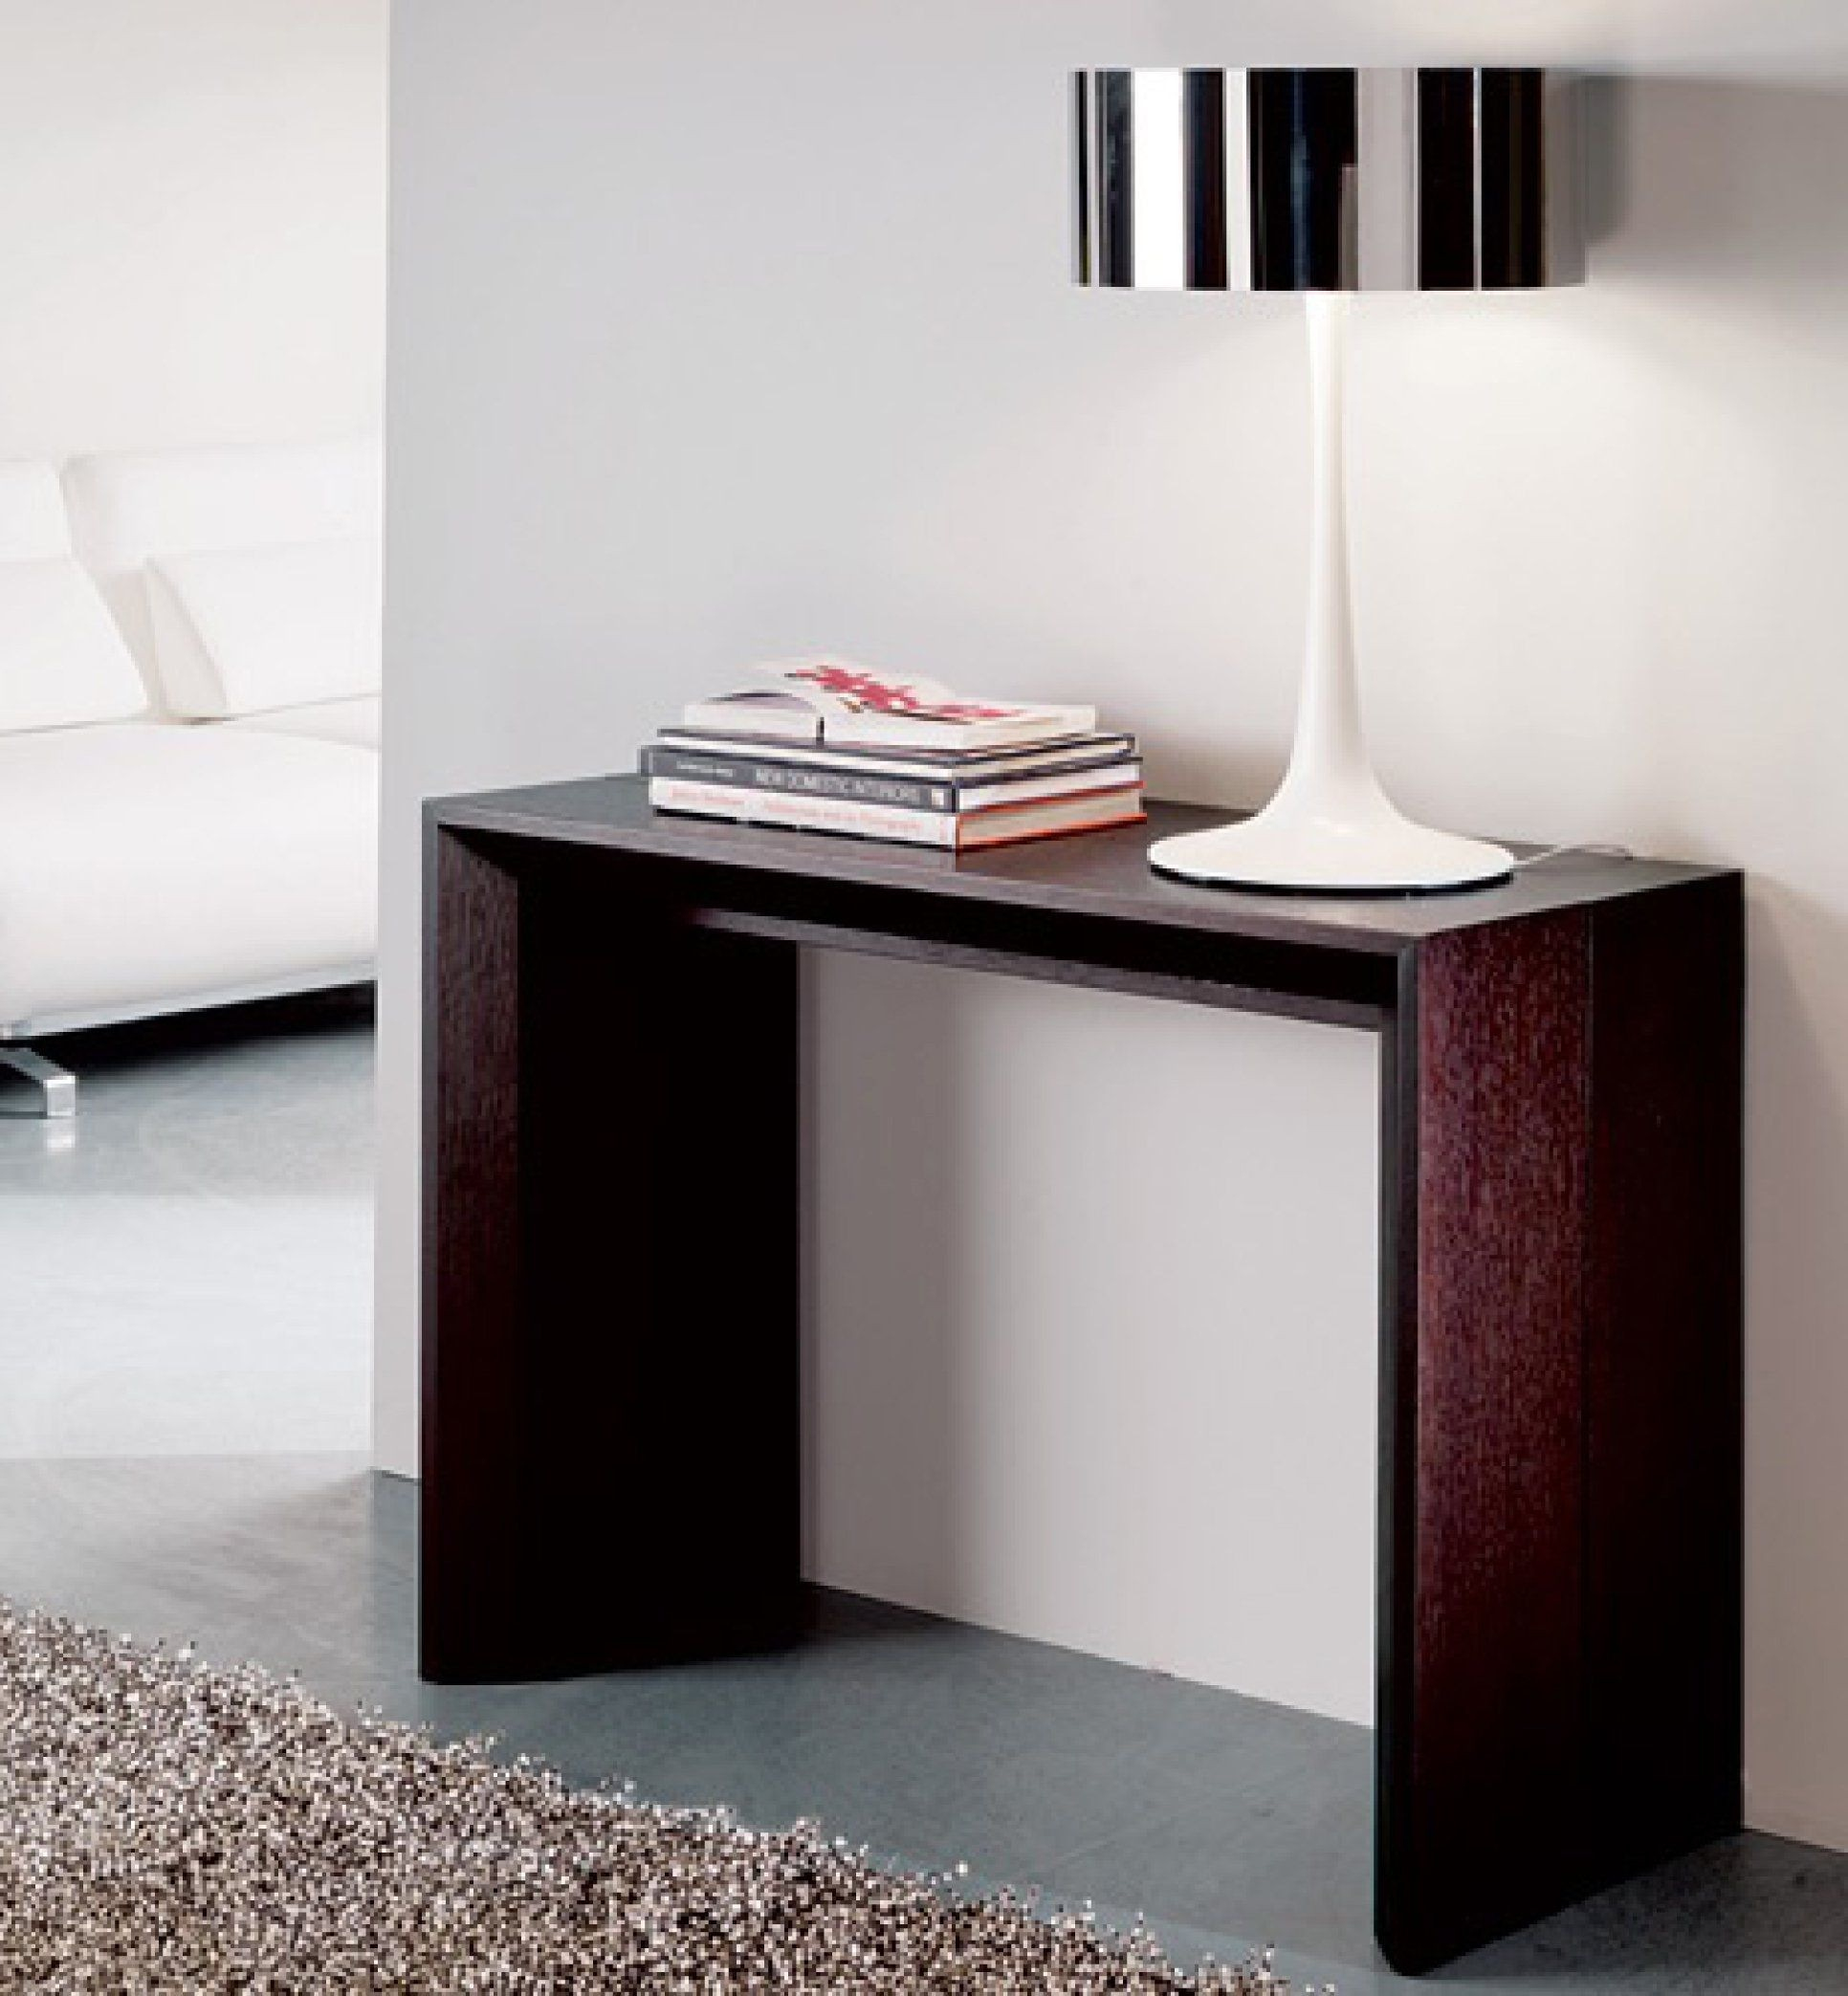 Table Basse Amazon Beau Collection Mecanisme Table Basse Relevable Best Mp Home & Garden Der Beste